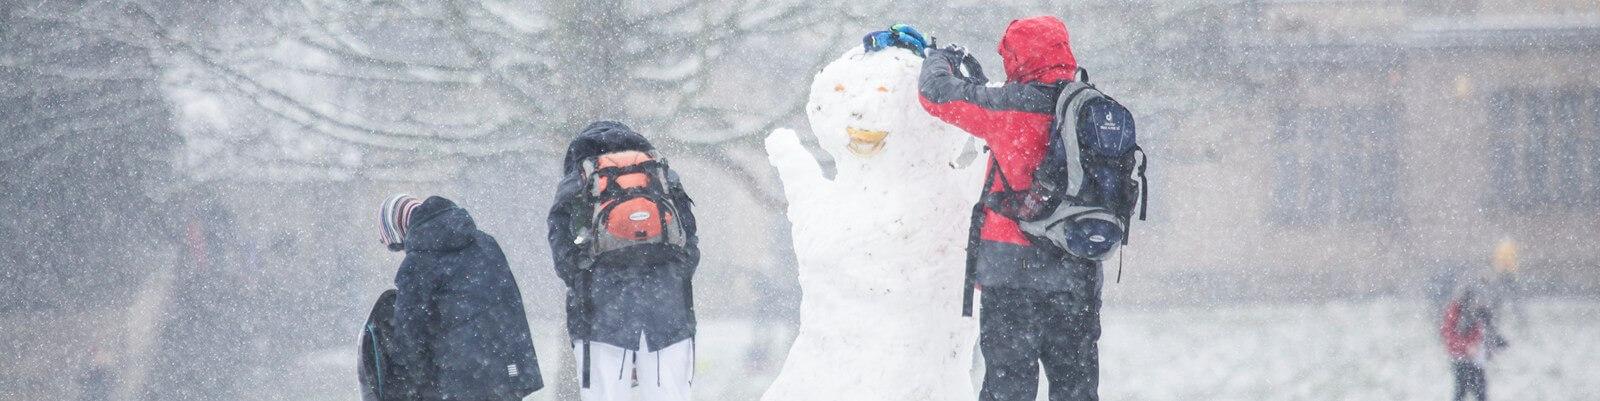 diana-parkhouse-1165995-unsplash snowday.jpg